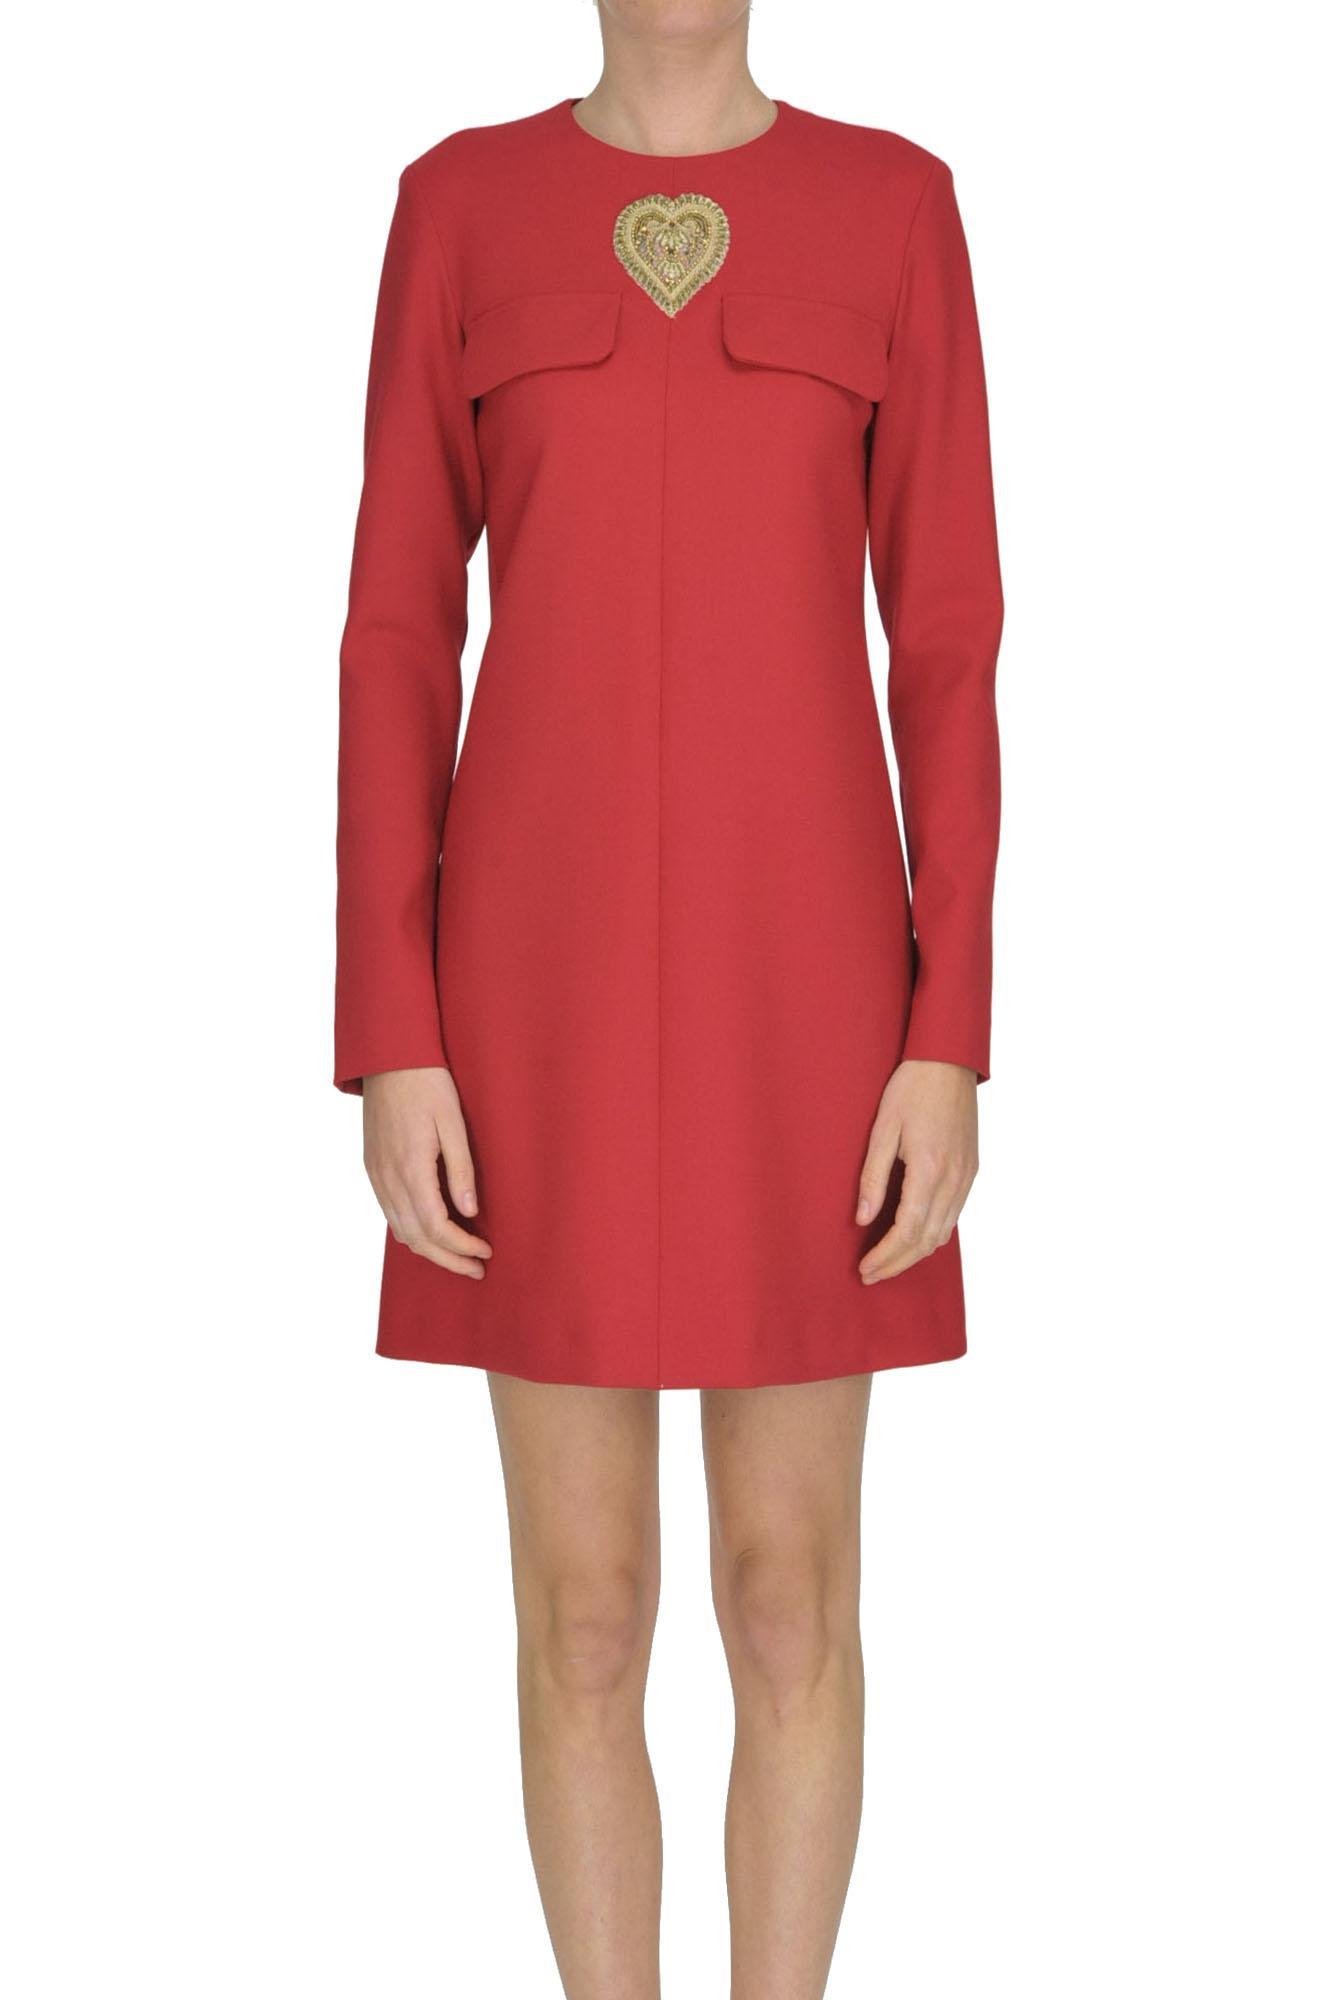 Bec & Bridge Bastille Dress | Garmentory  |Bastille Dress